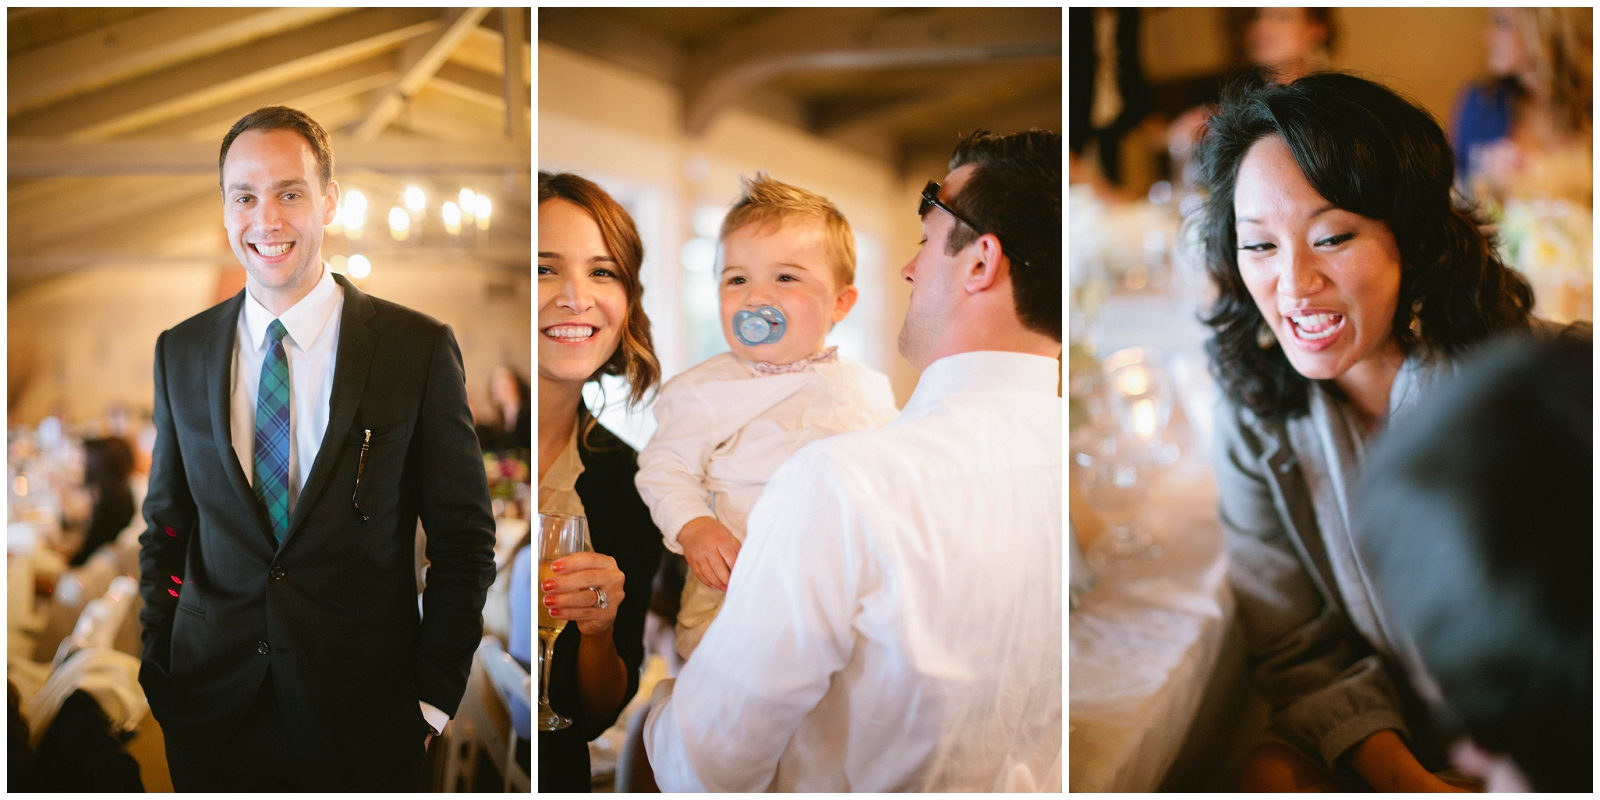 San-Francisco-Bay-Area-Wedding-Photography-Kennolyn-15.jpg